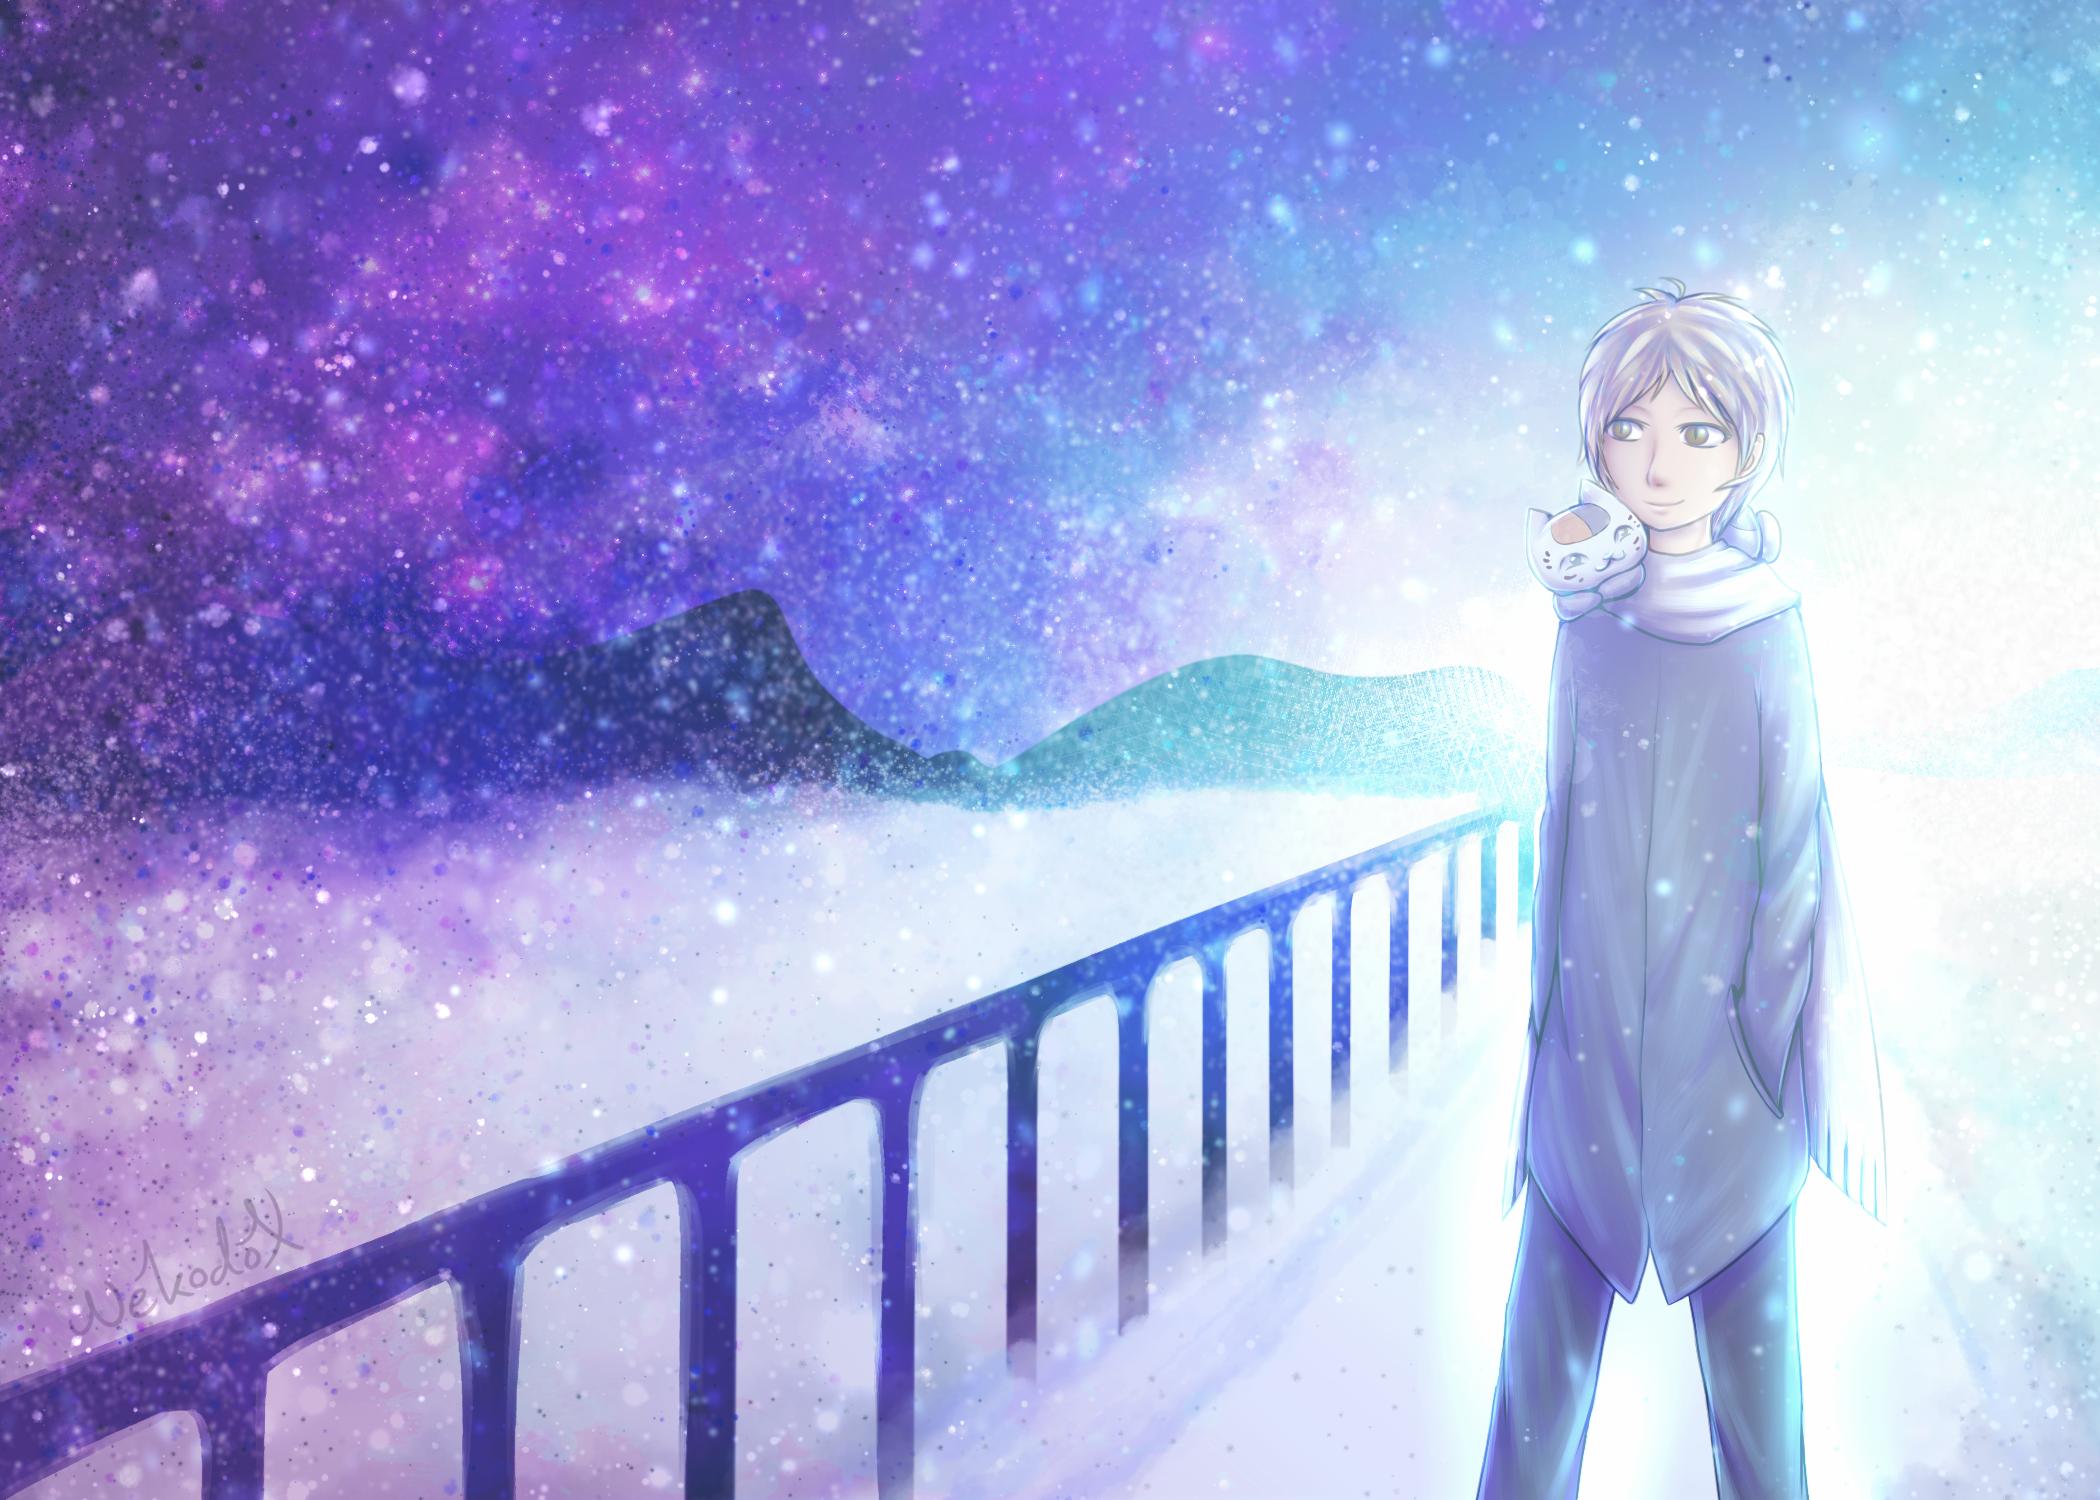 [Natsume Yuujinchou] Winter Evening by Nekodox